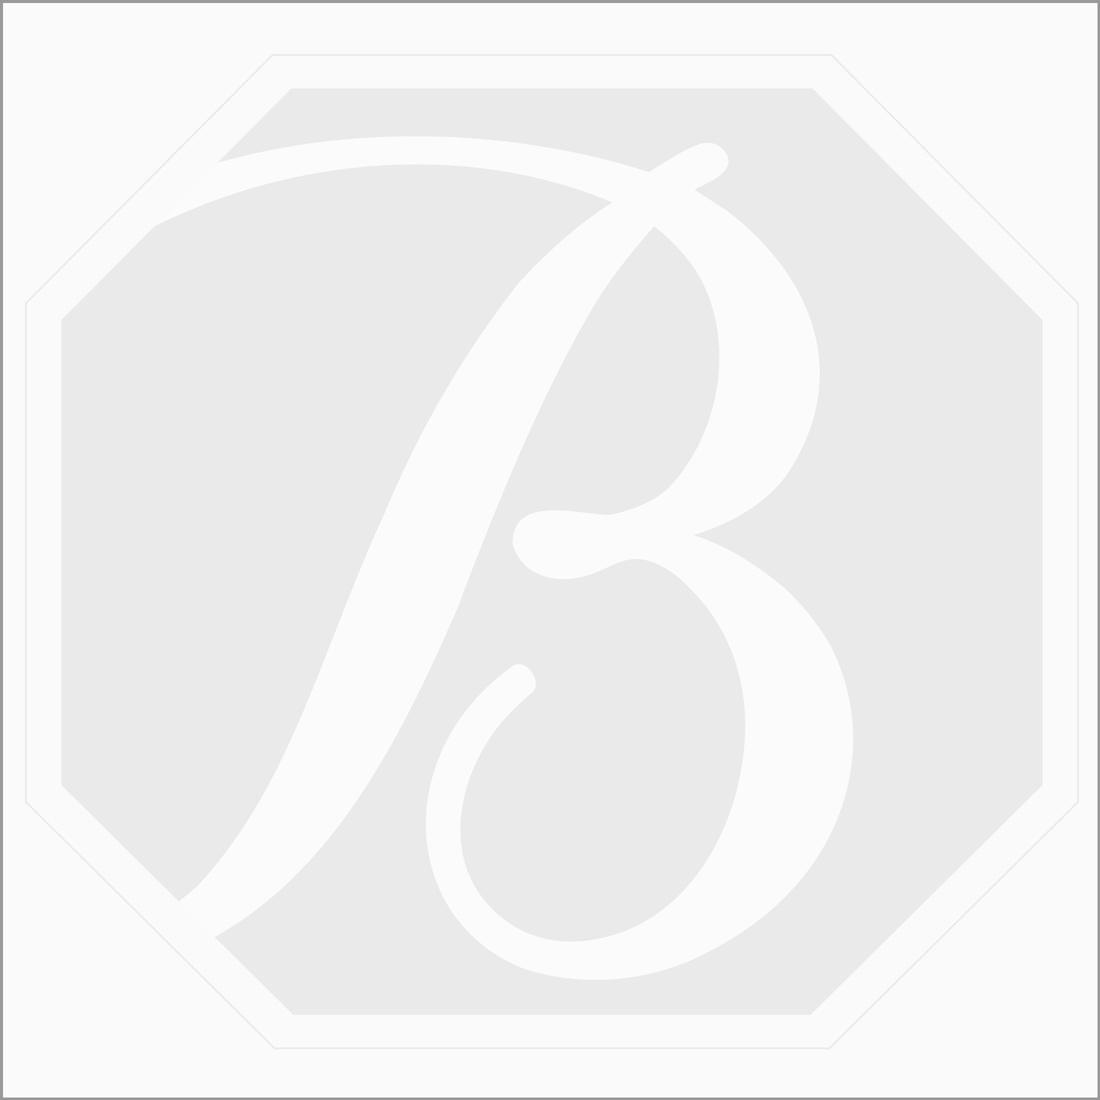 1.52 ct. - Oval (I-VS2) White Rose Cut Diamond Photograph